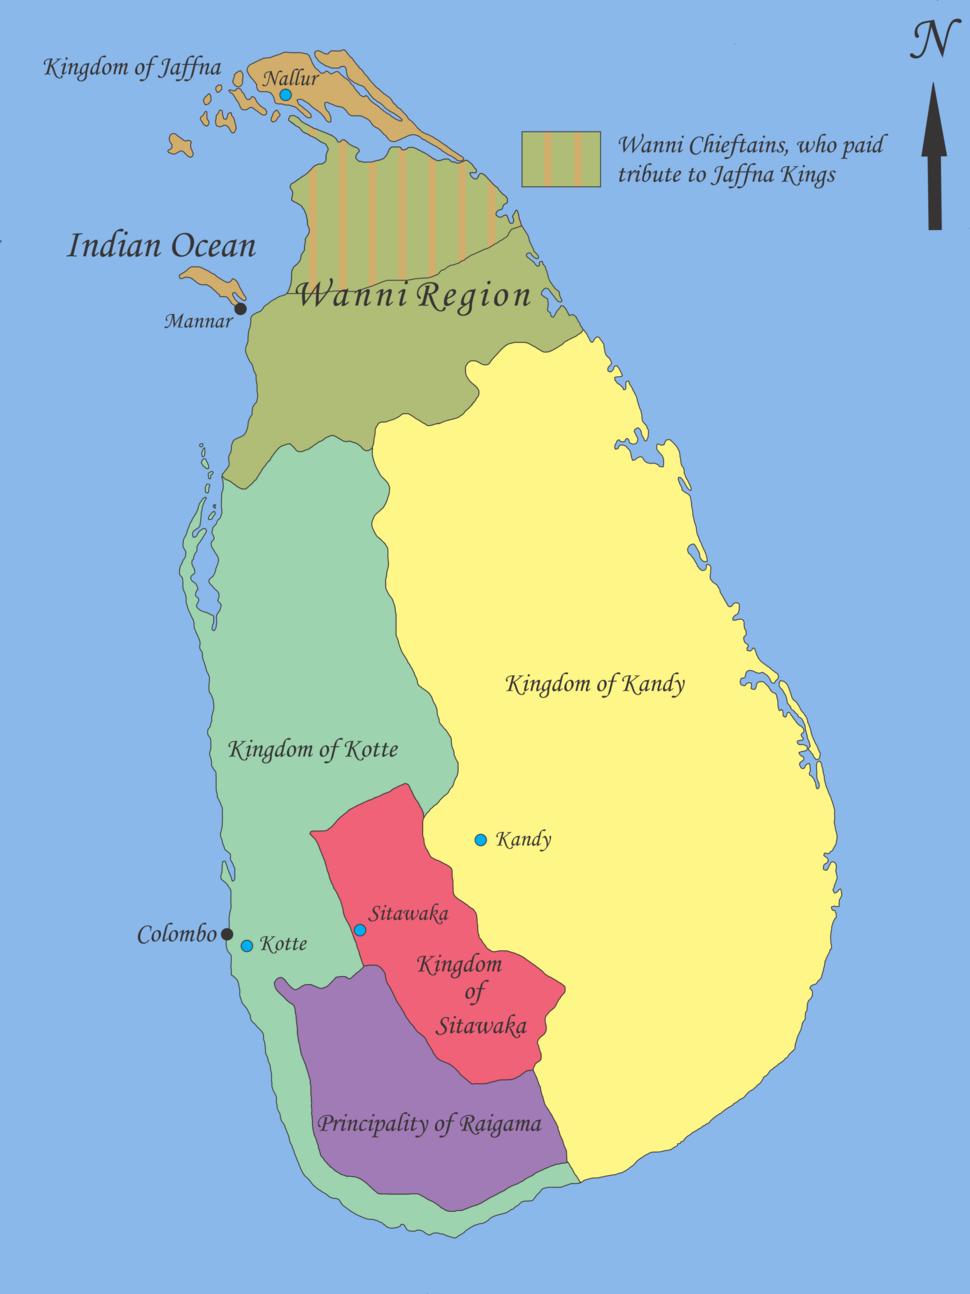 Sri Lanka geopolitics - after %22Spoiling of Vijayabahu%22